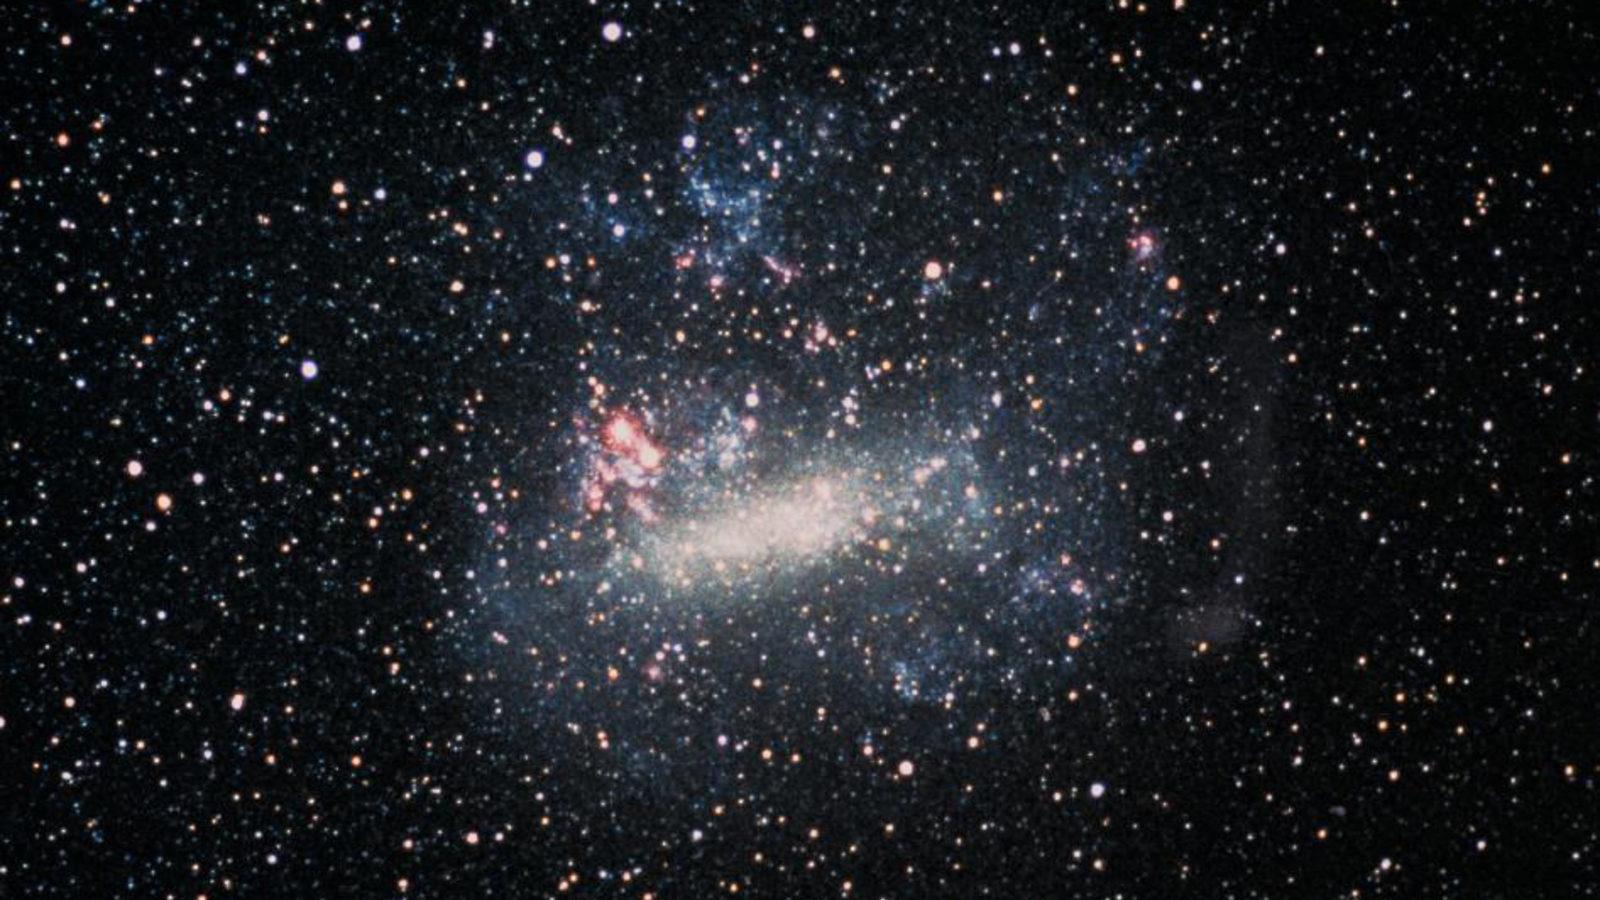 Image: Supernova 1987A